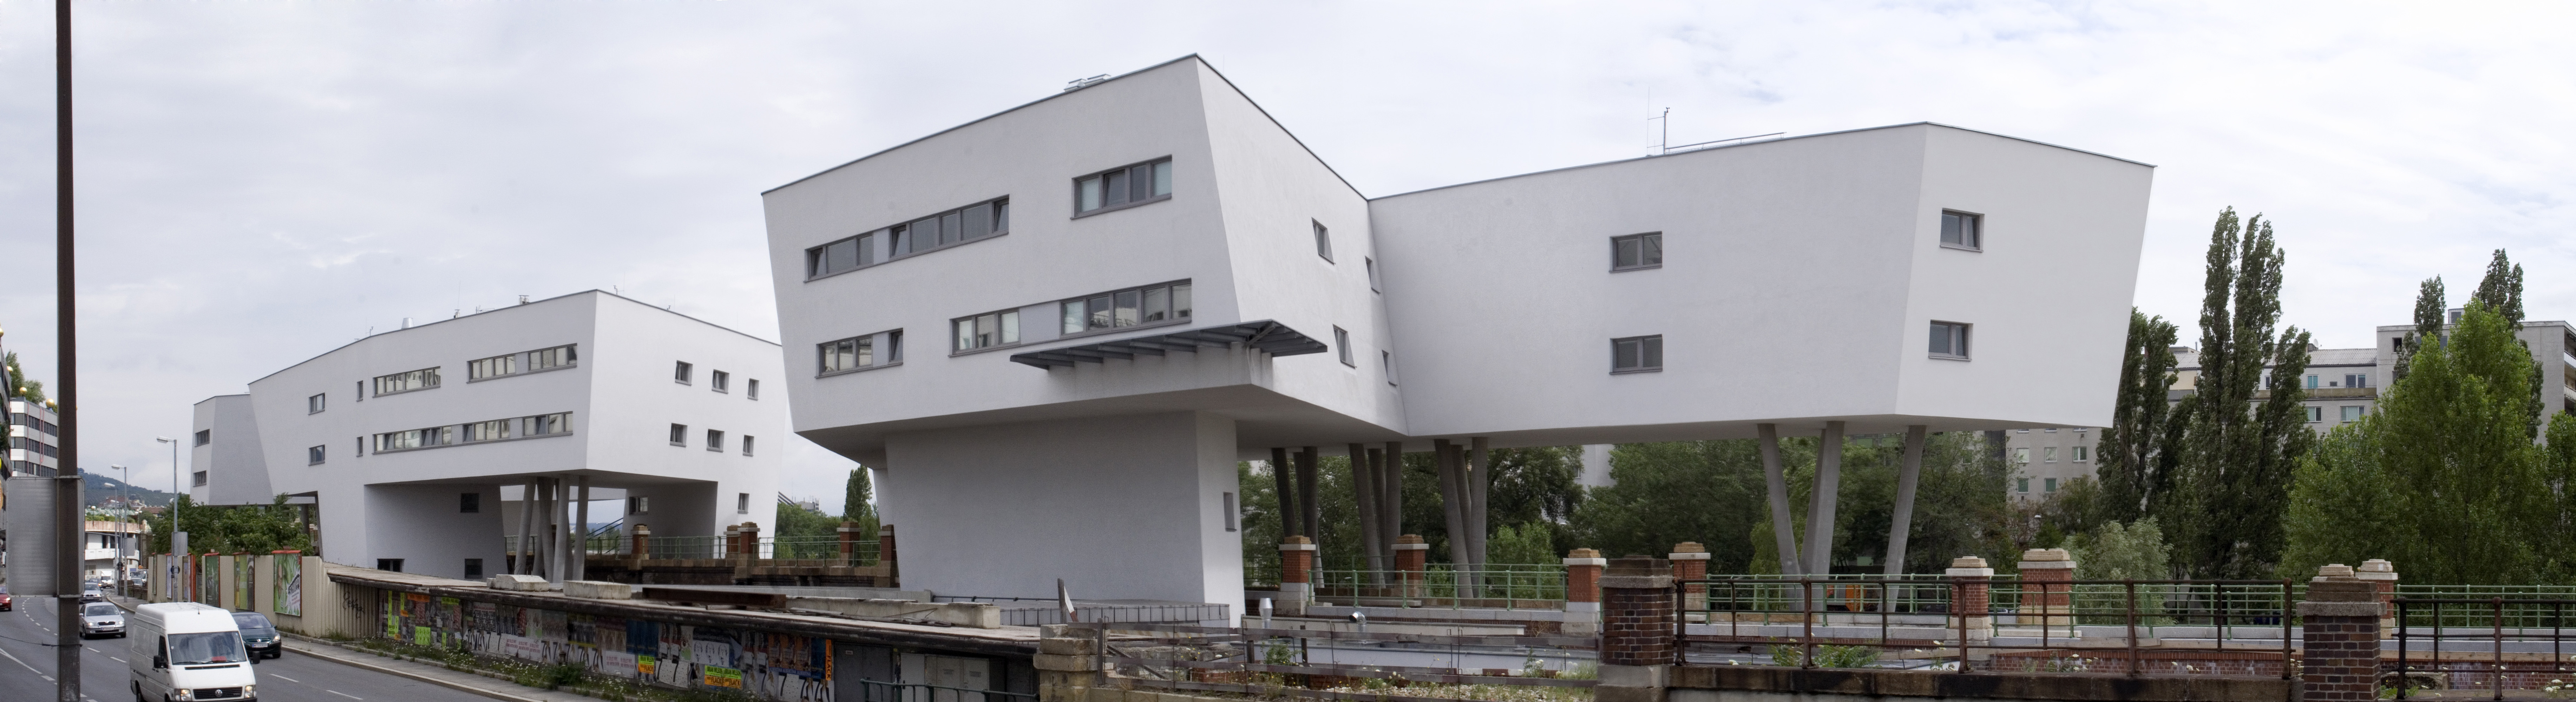 Https Www Housing Wisc Edu Residencehalls Halls Tours Htm